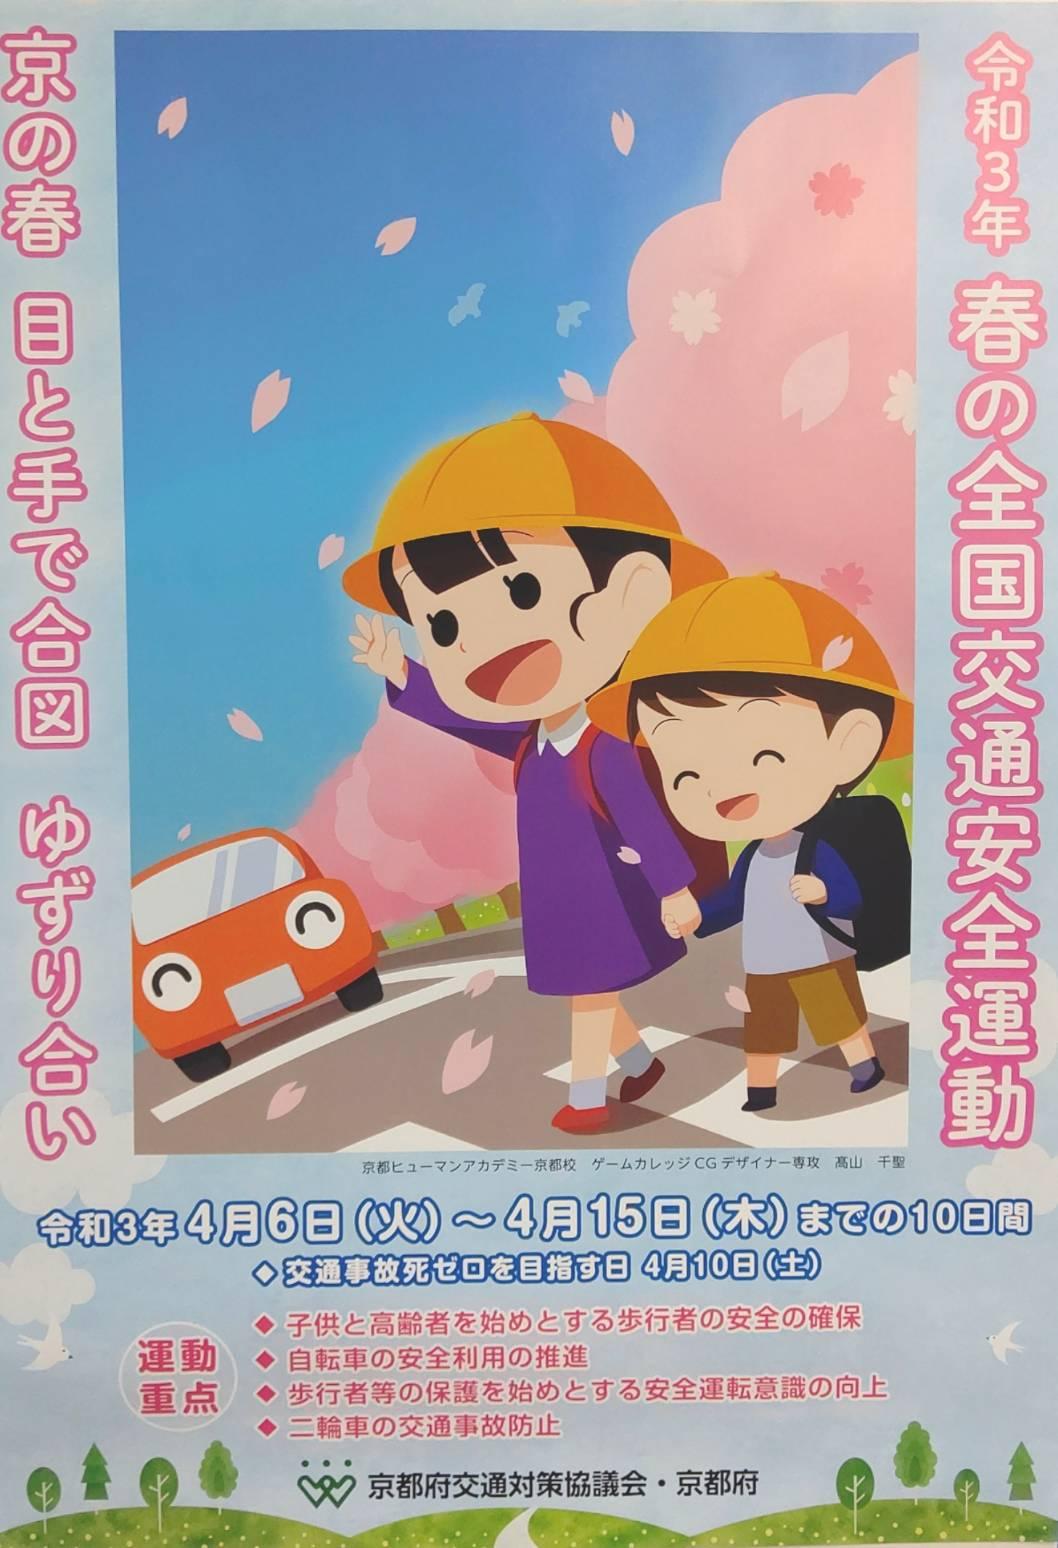 京都校:春の全国交通安全運動ポスター.jpg